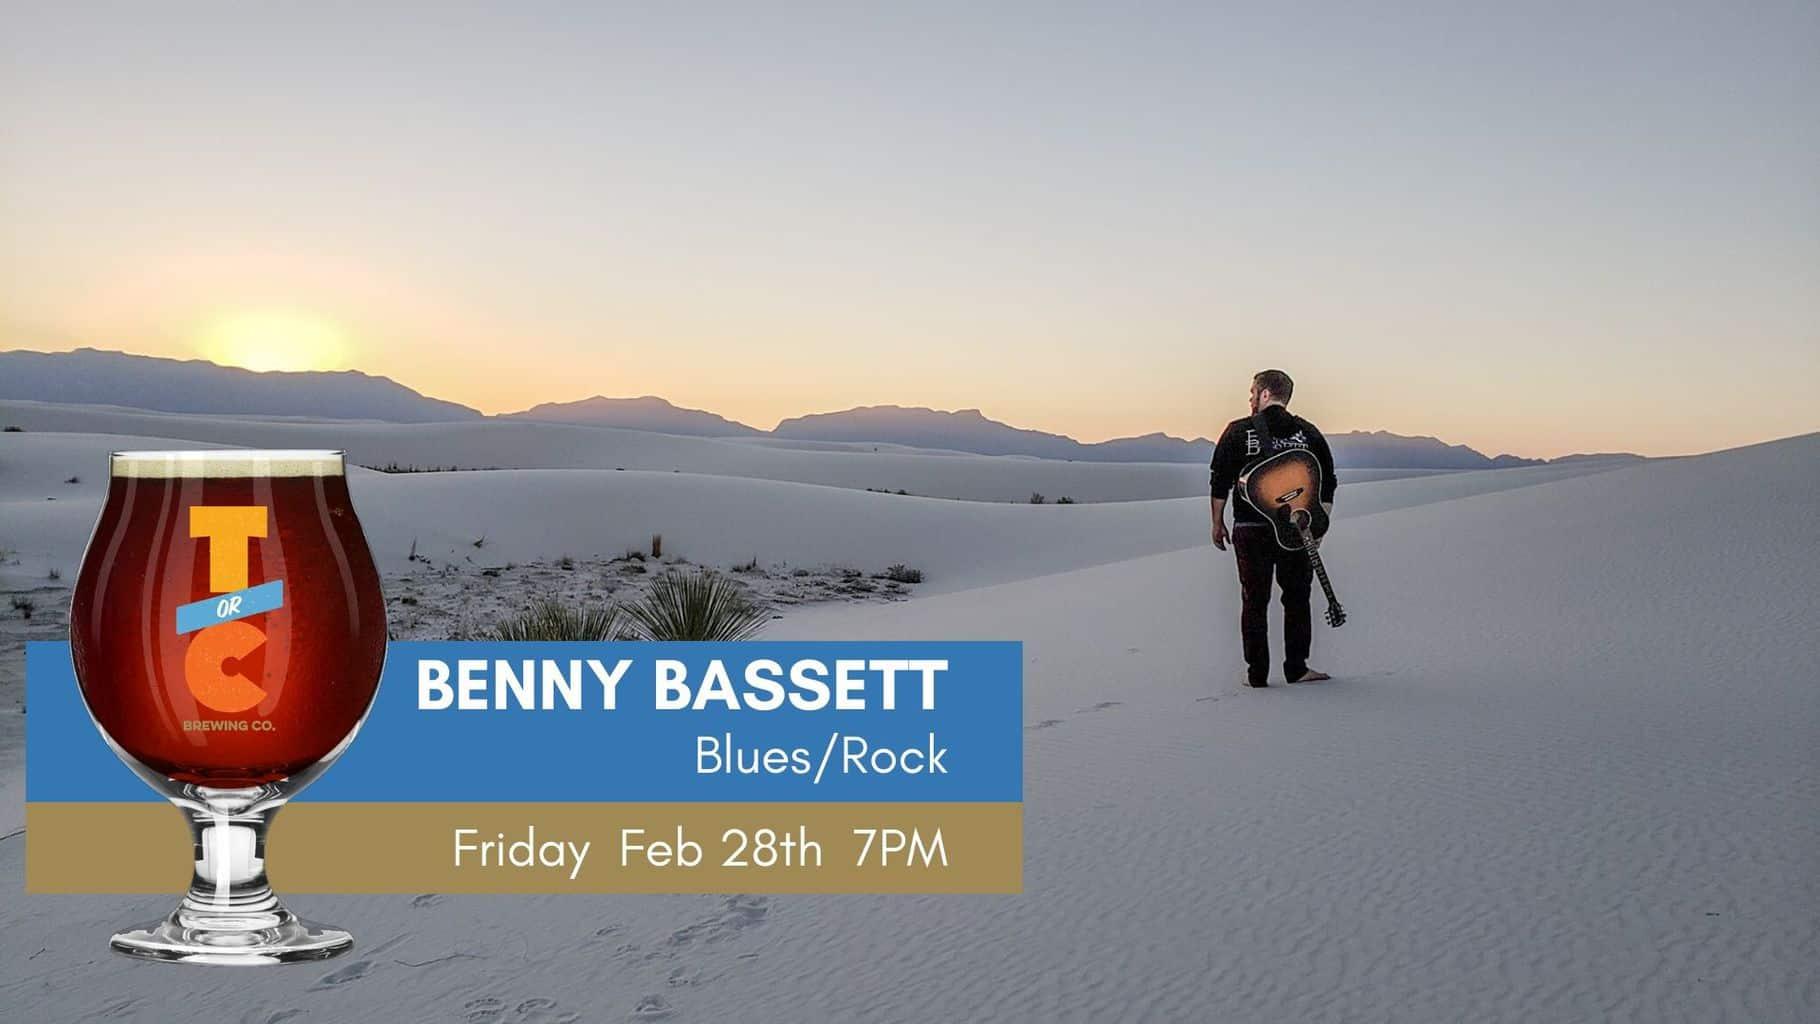 Benny Bassett